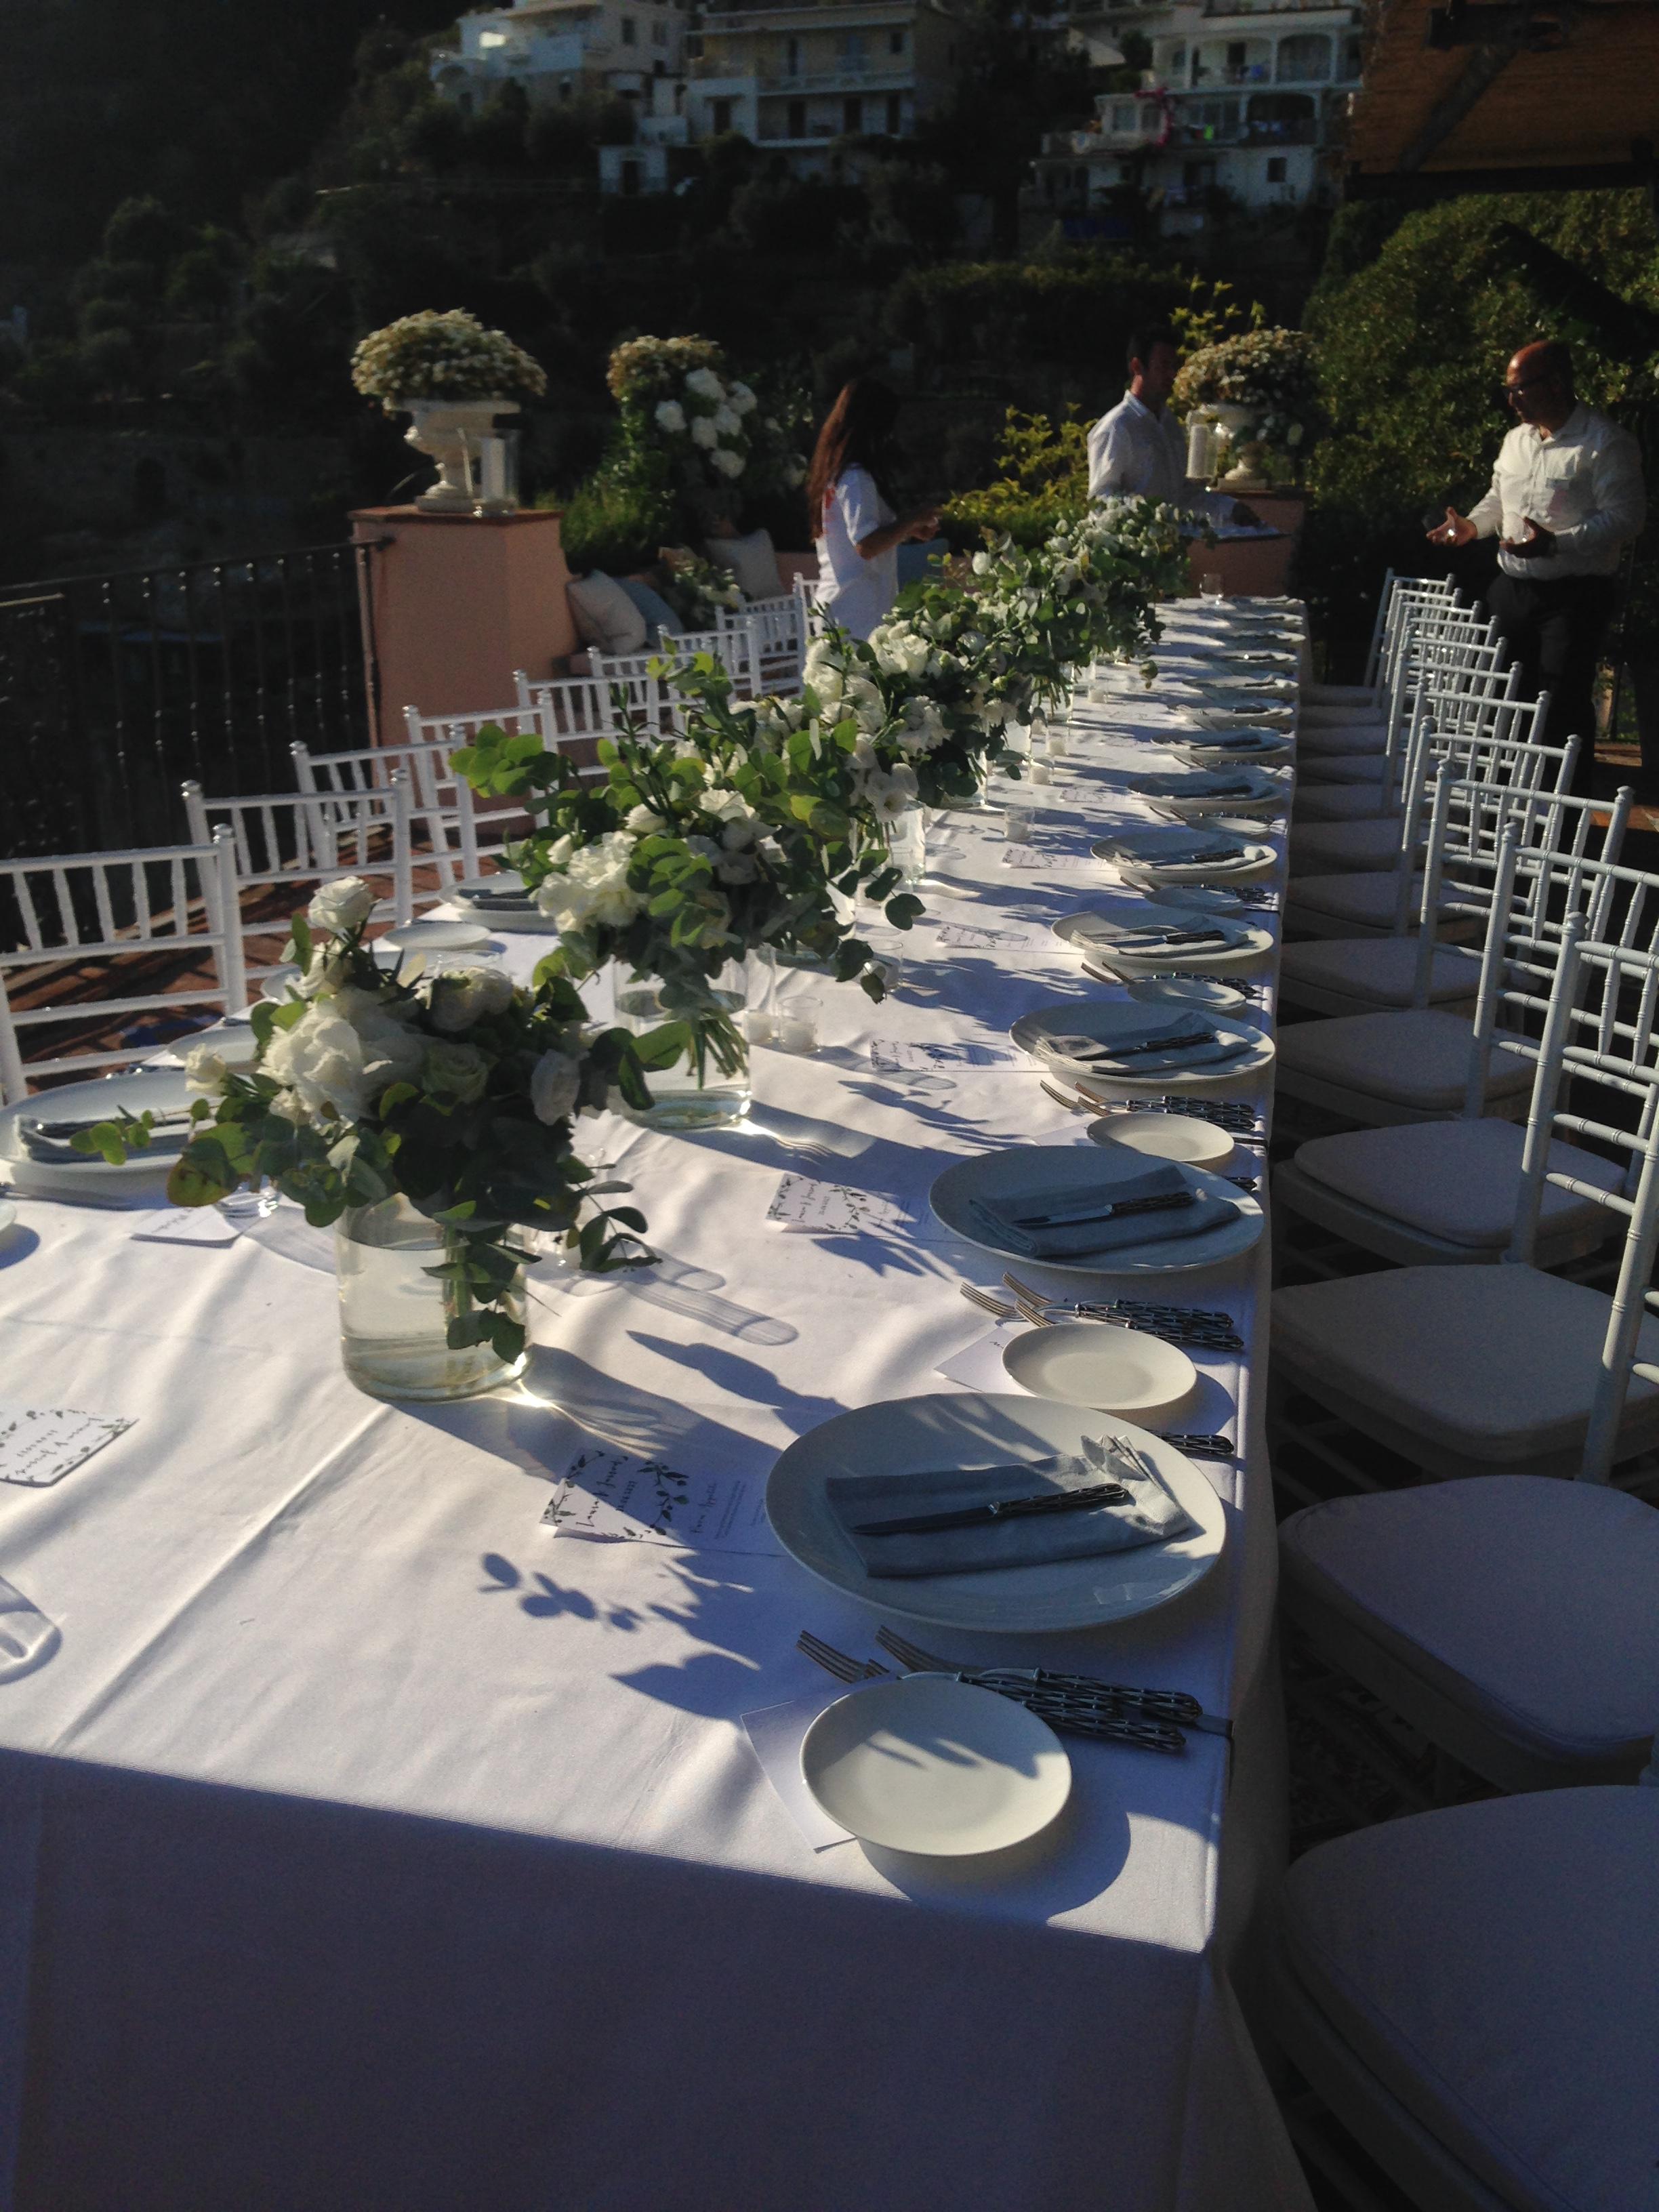 https://www.weddingamalfi.com/wp-content/uploads/Laura-and-Jarrod-wedding-table-decoration.jpg